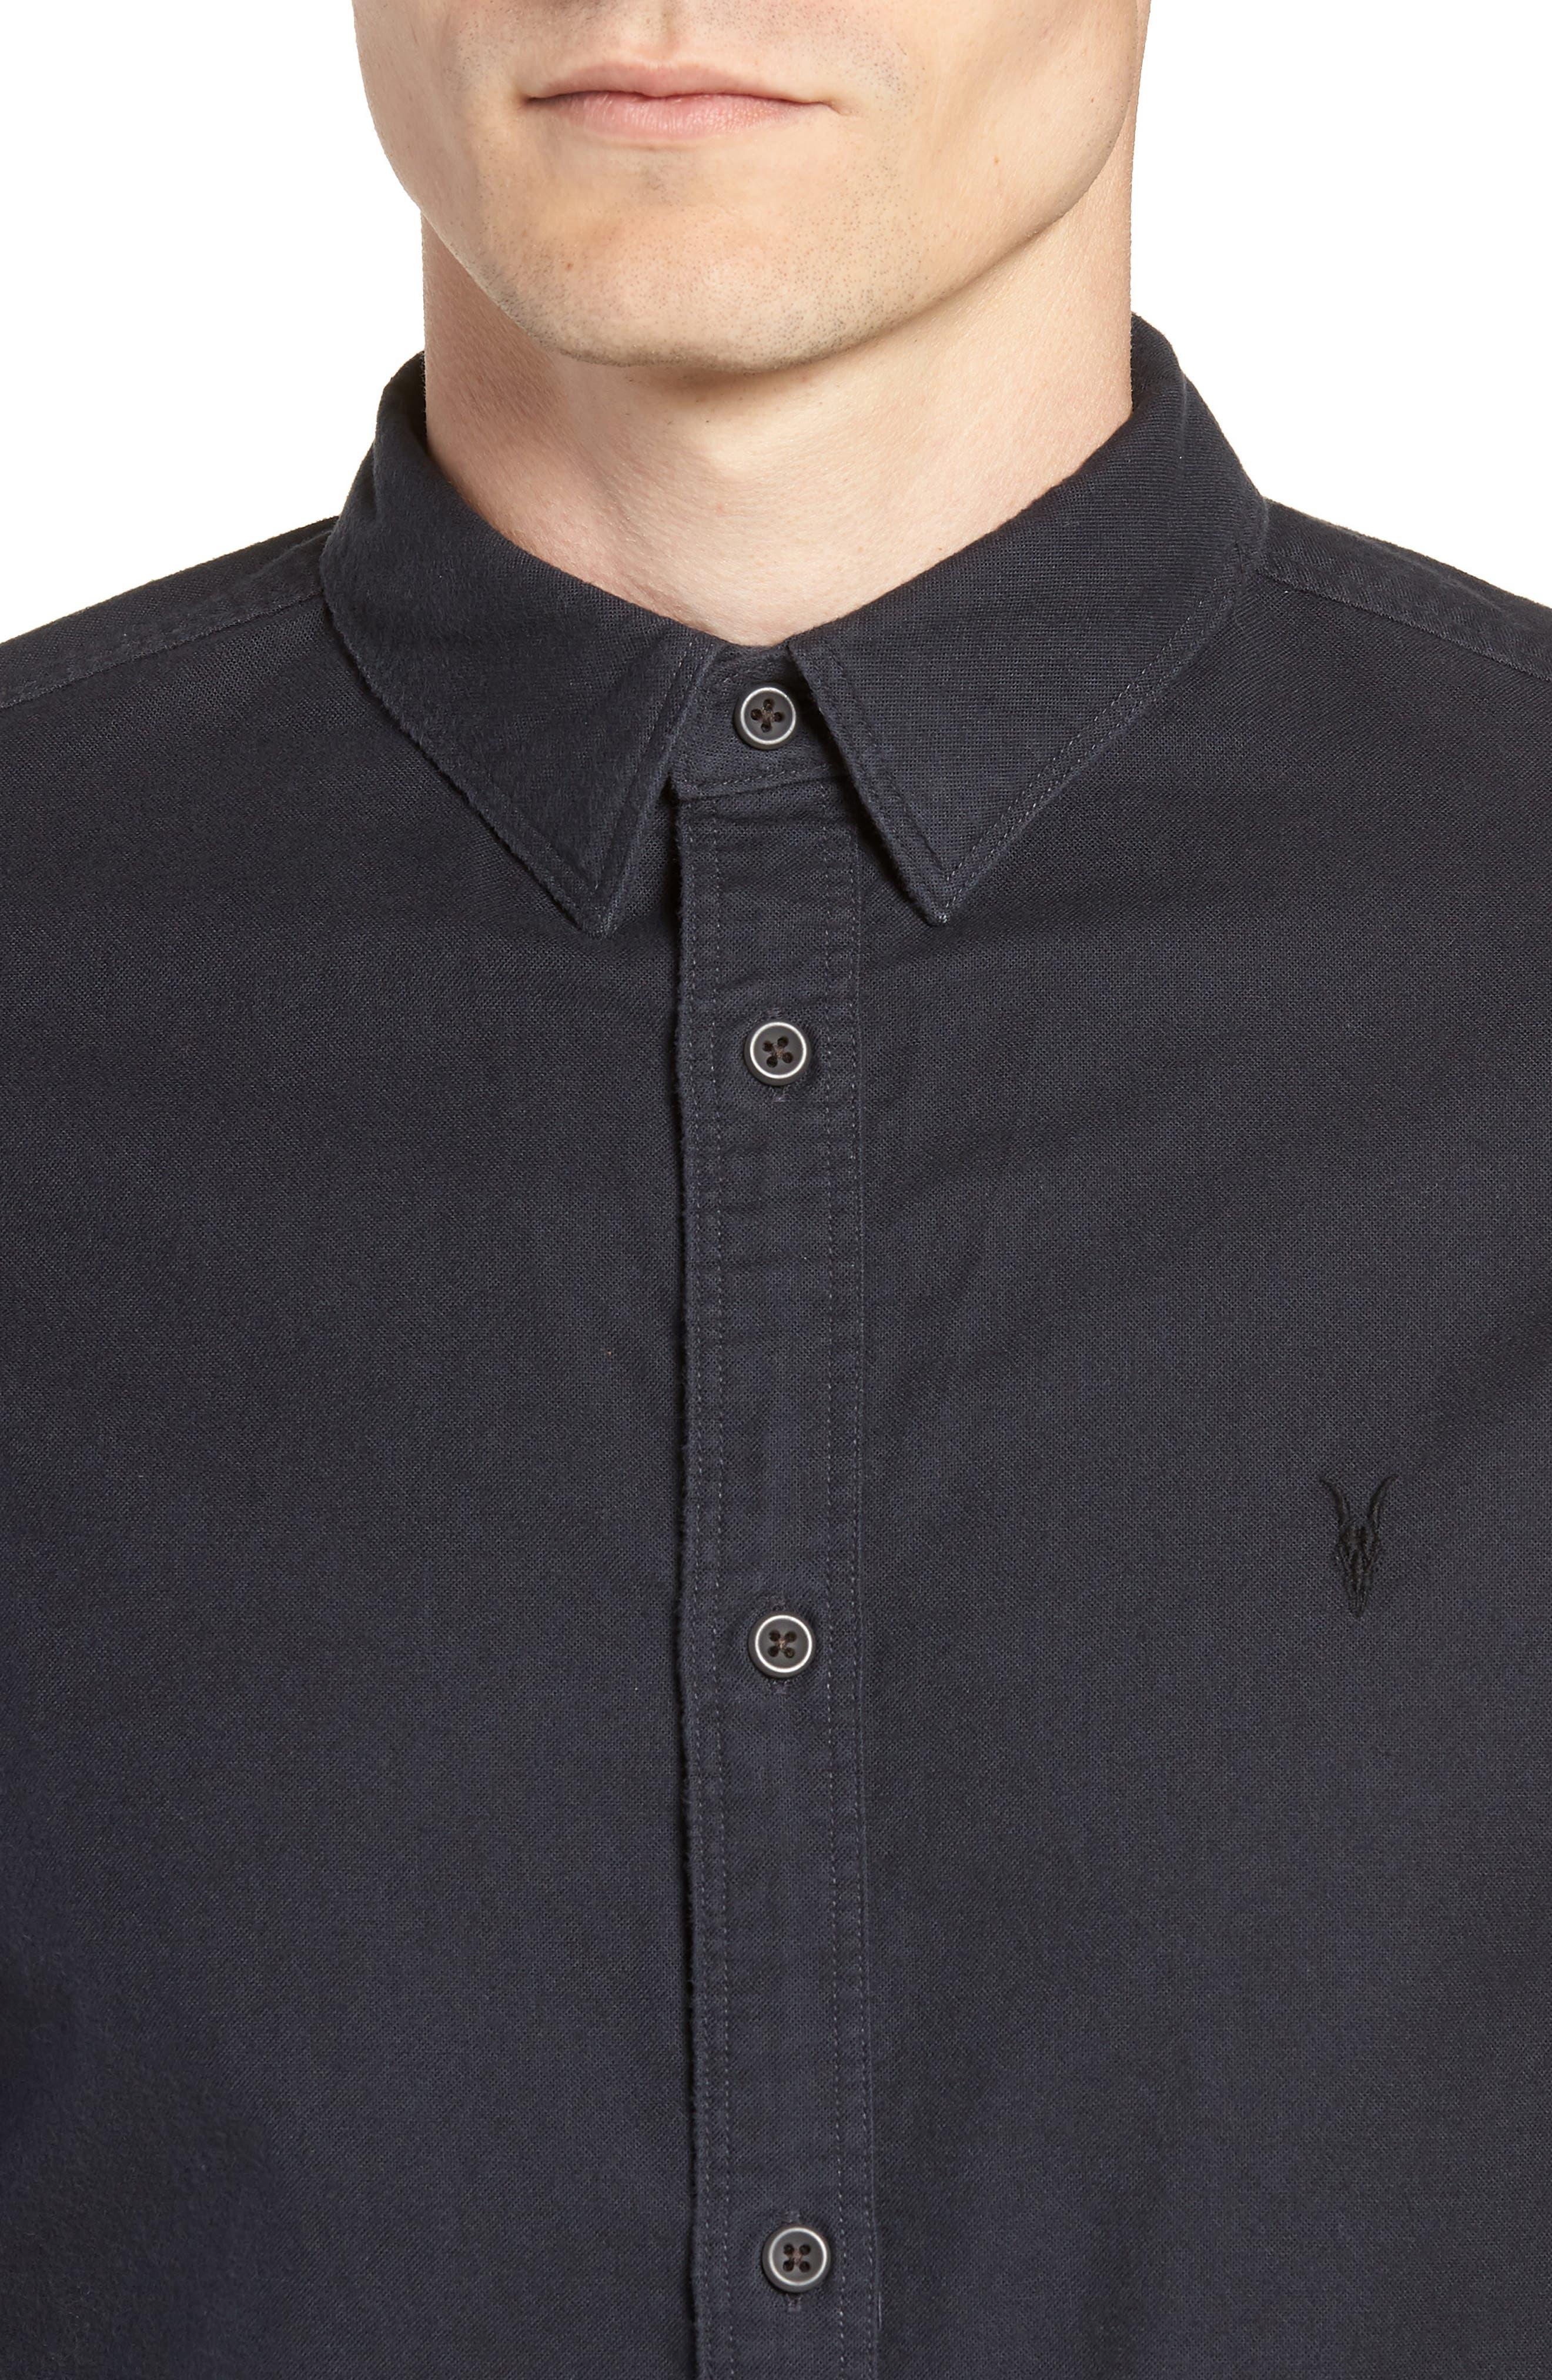 Huntington Regular Fit Short Sleeve Sport Shirt,                             Alternate thumbnail 9, color,